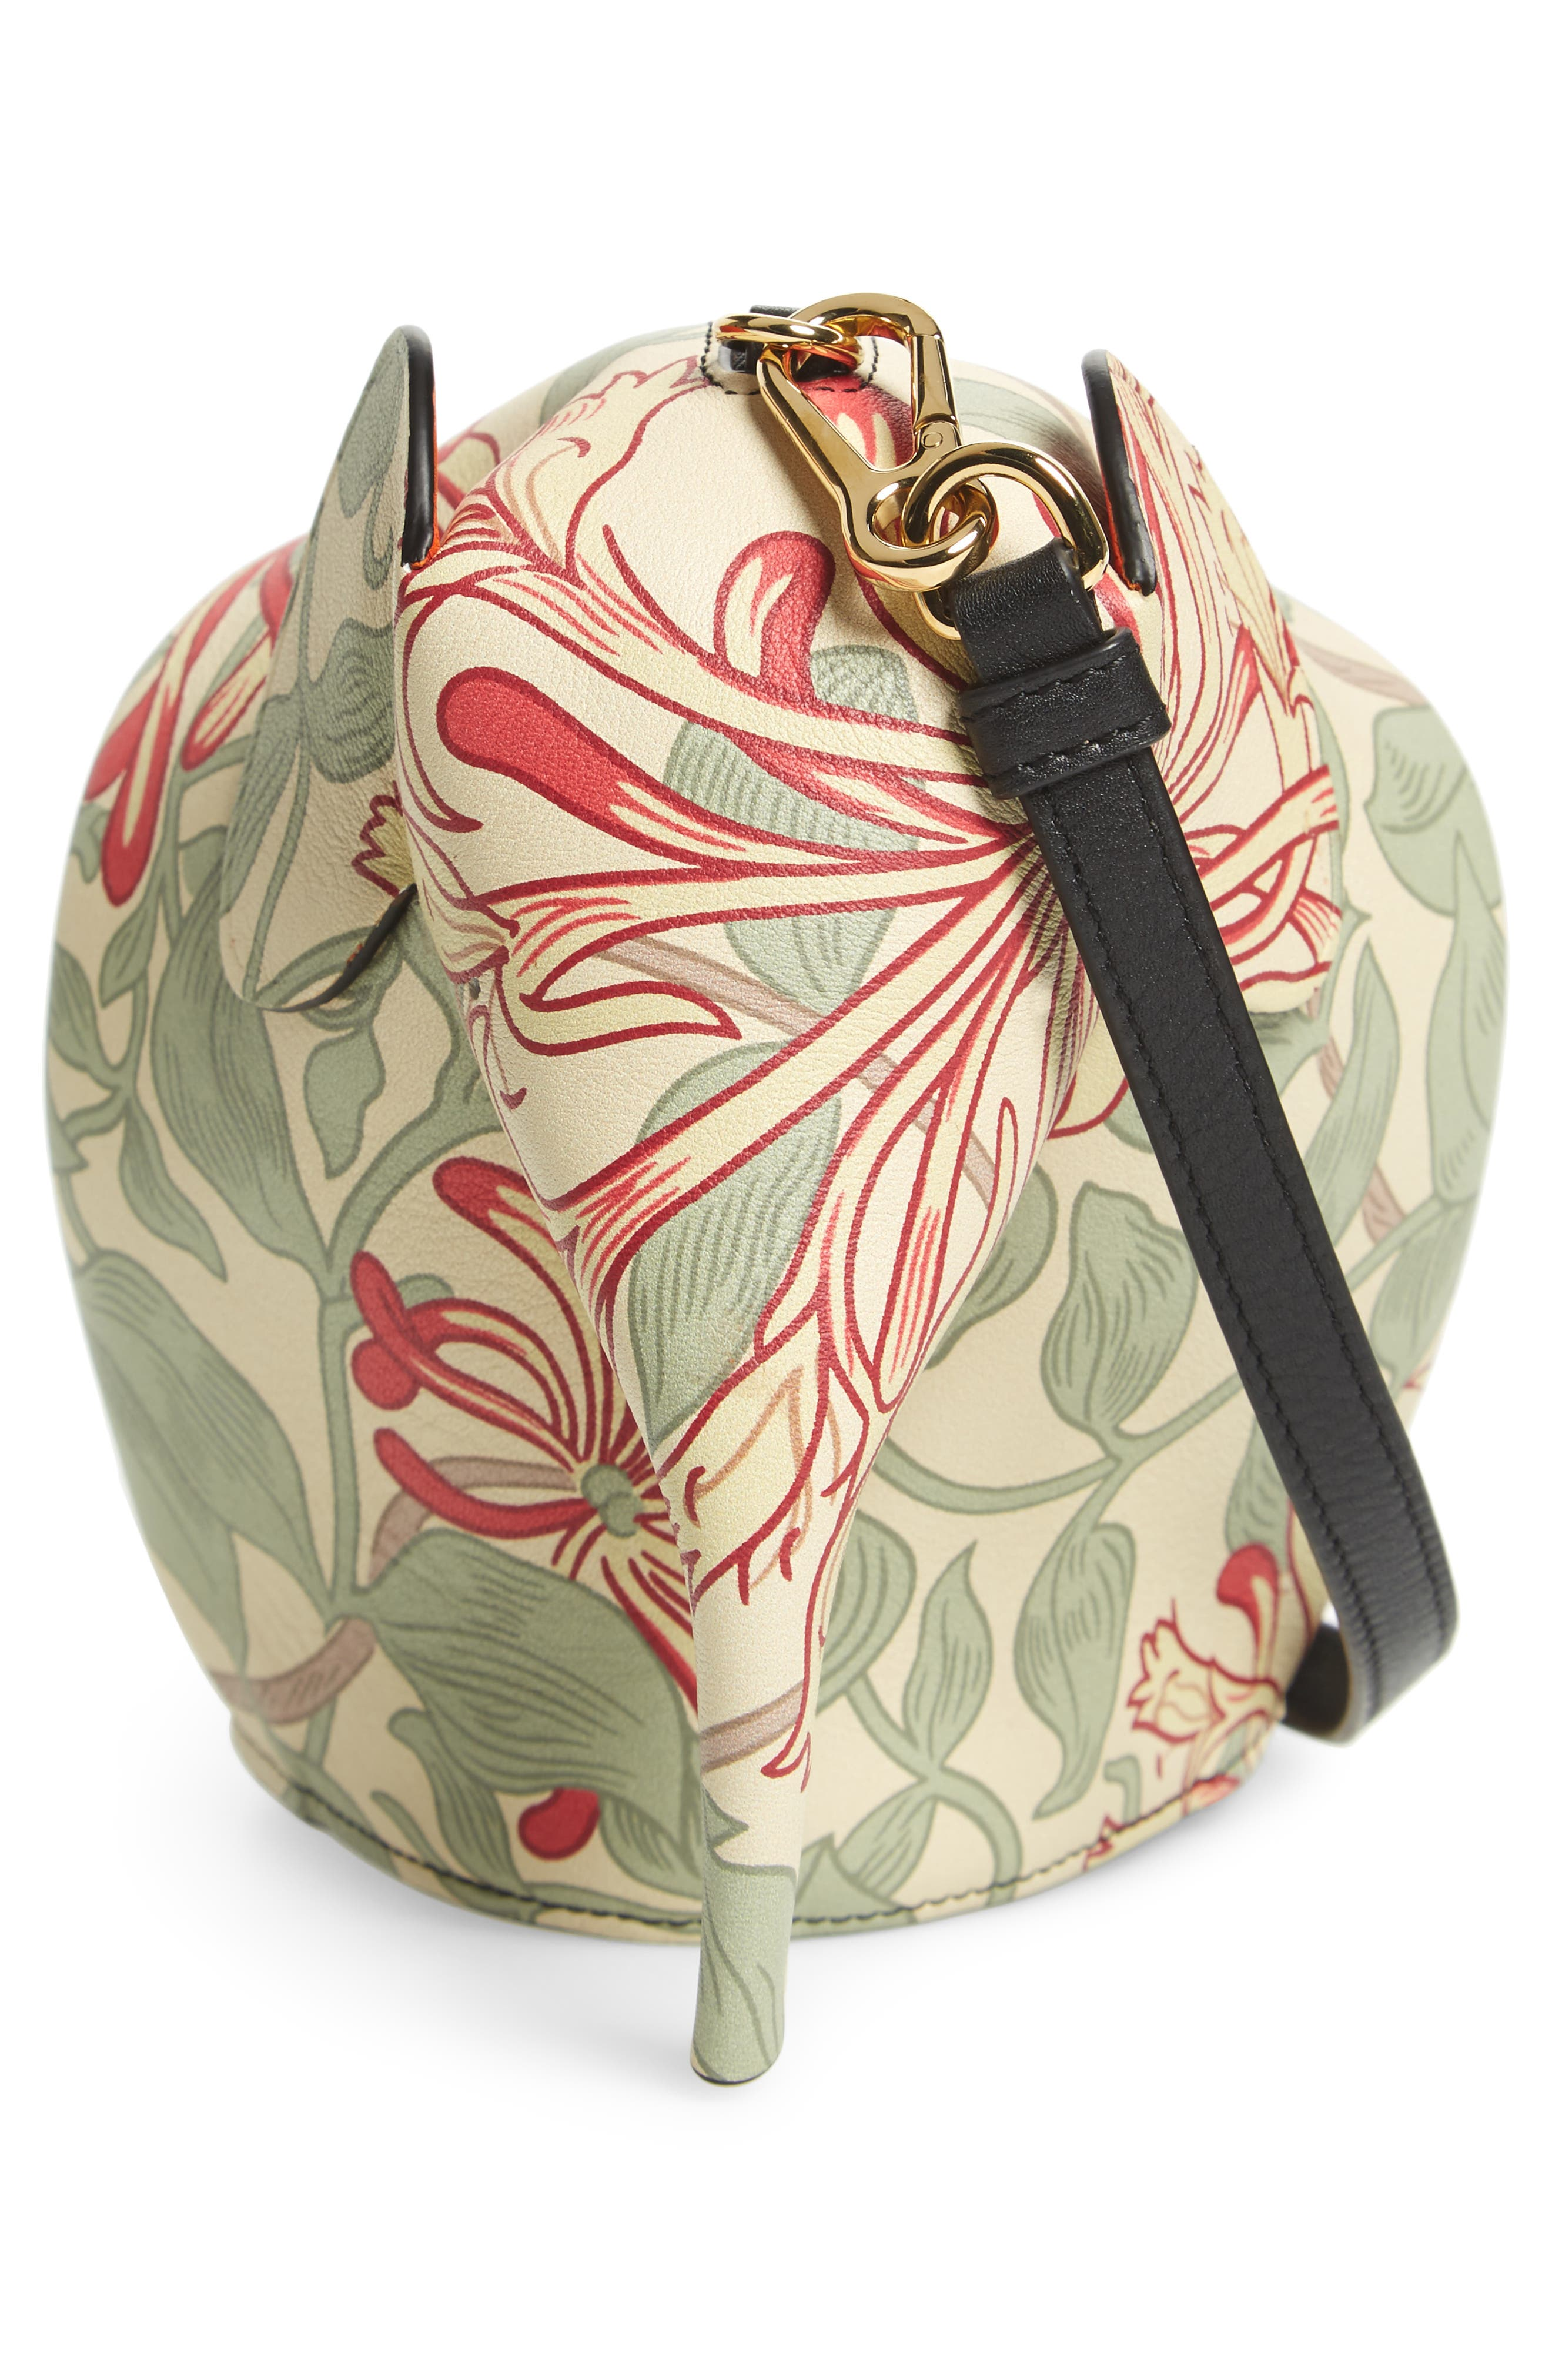 Mini Elephant Honeysuckle Print Leather Crossbody Bag,                             Alternate thumbnail 6, color,                             Beige/ Green/ Multicolour